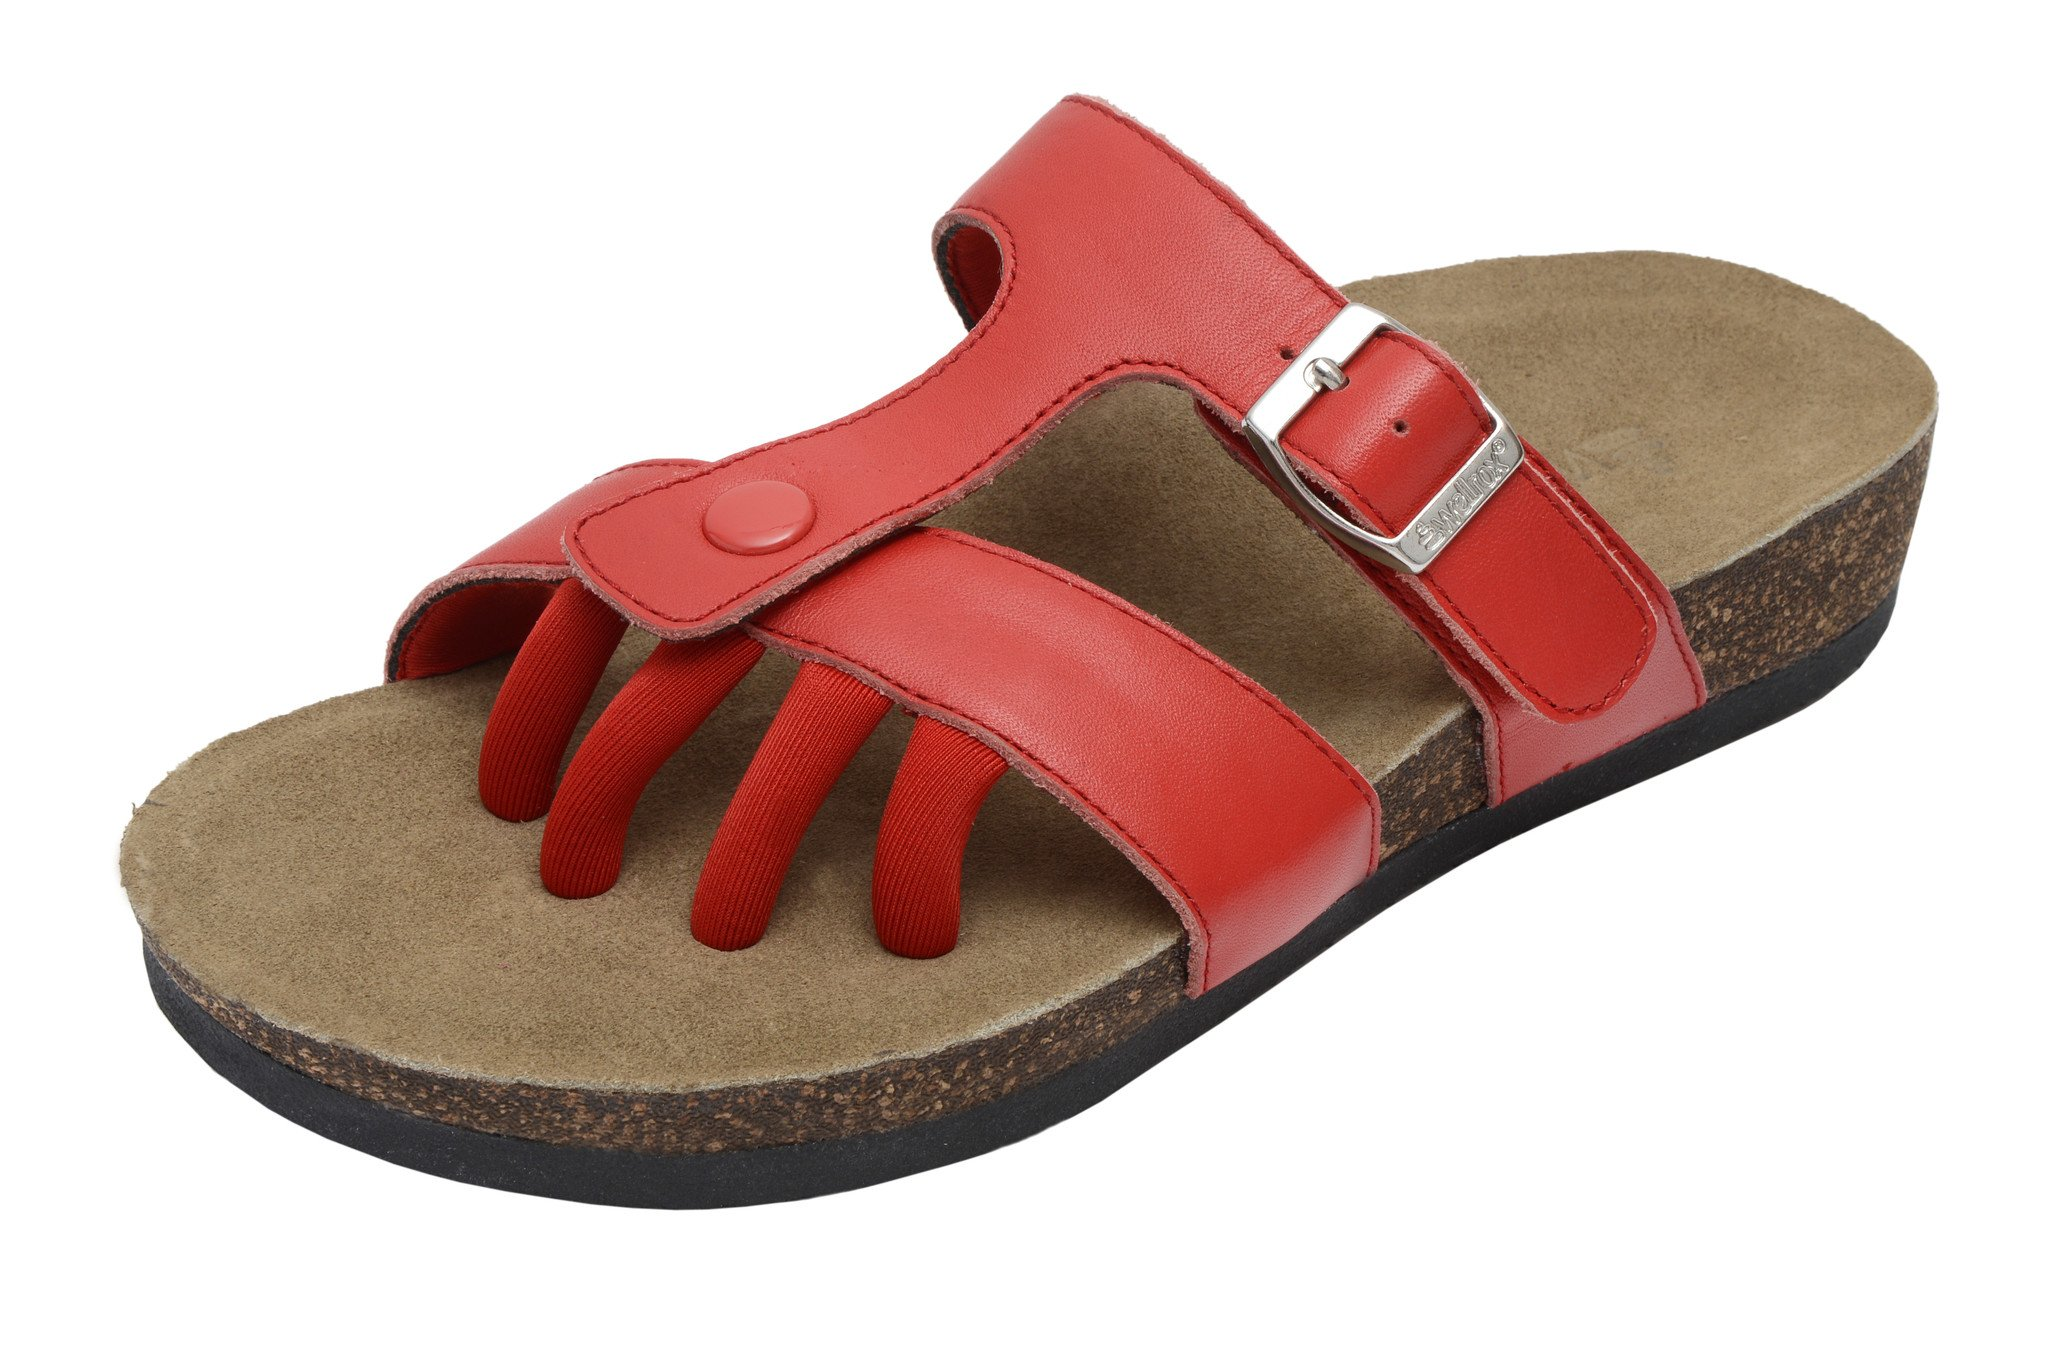 WELLROX Women's Santa Fe Sedona Toe-Separator Wellness Sandals $89.99 NEW;  Picture 2 of 2